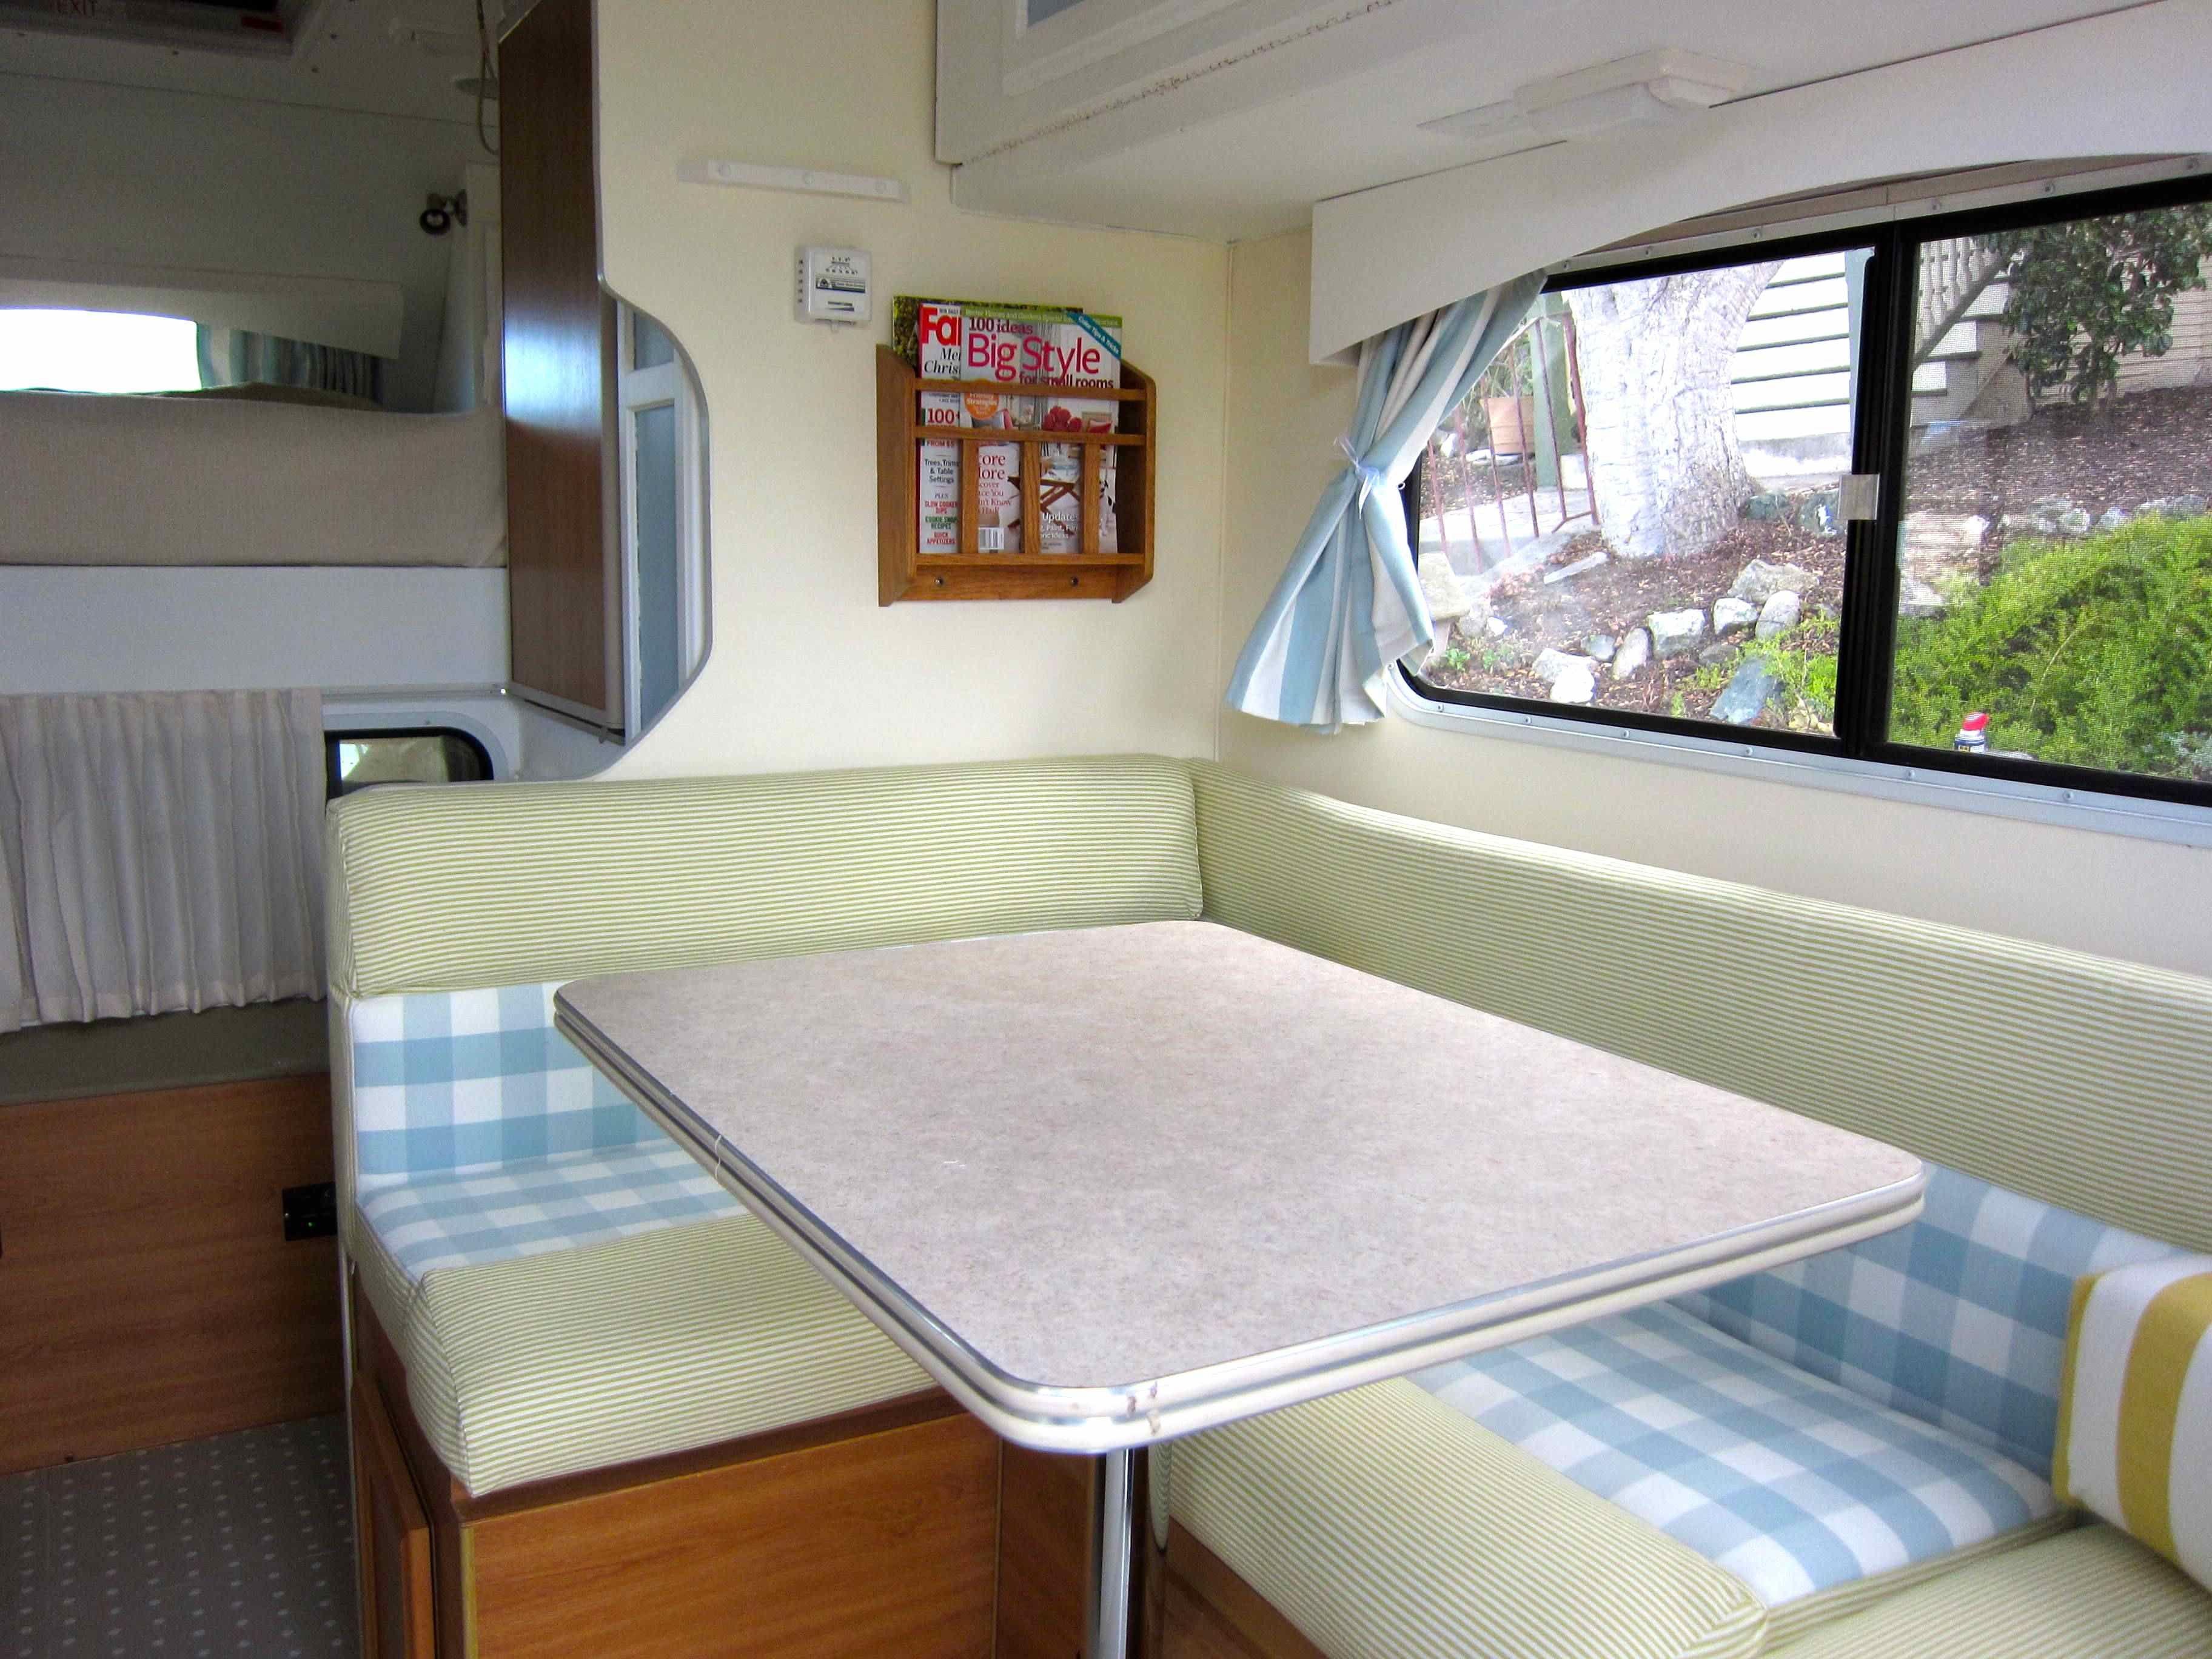 #vintagecaravan #campervan #camping #silverashcampers   Lounge / dinette area of the new Lance unit. Available for rental in lovely Monterey California http://www.silverashcampers.com/